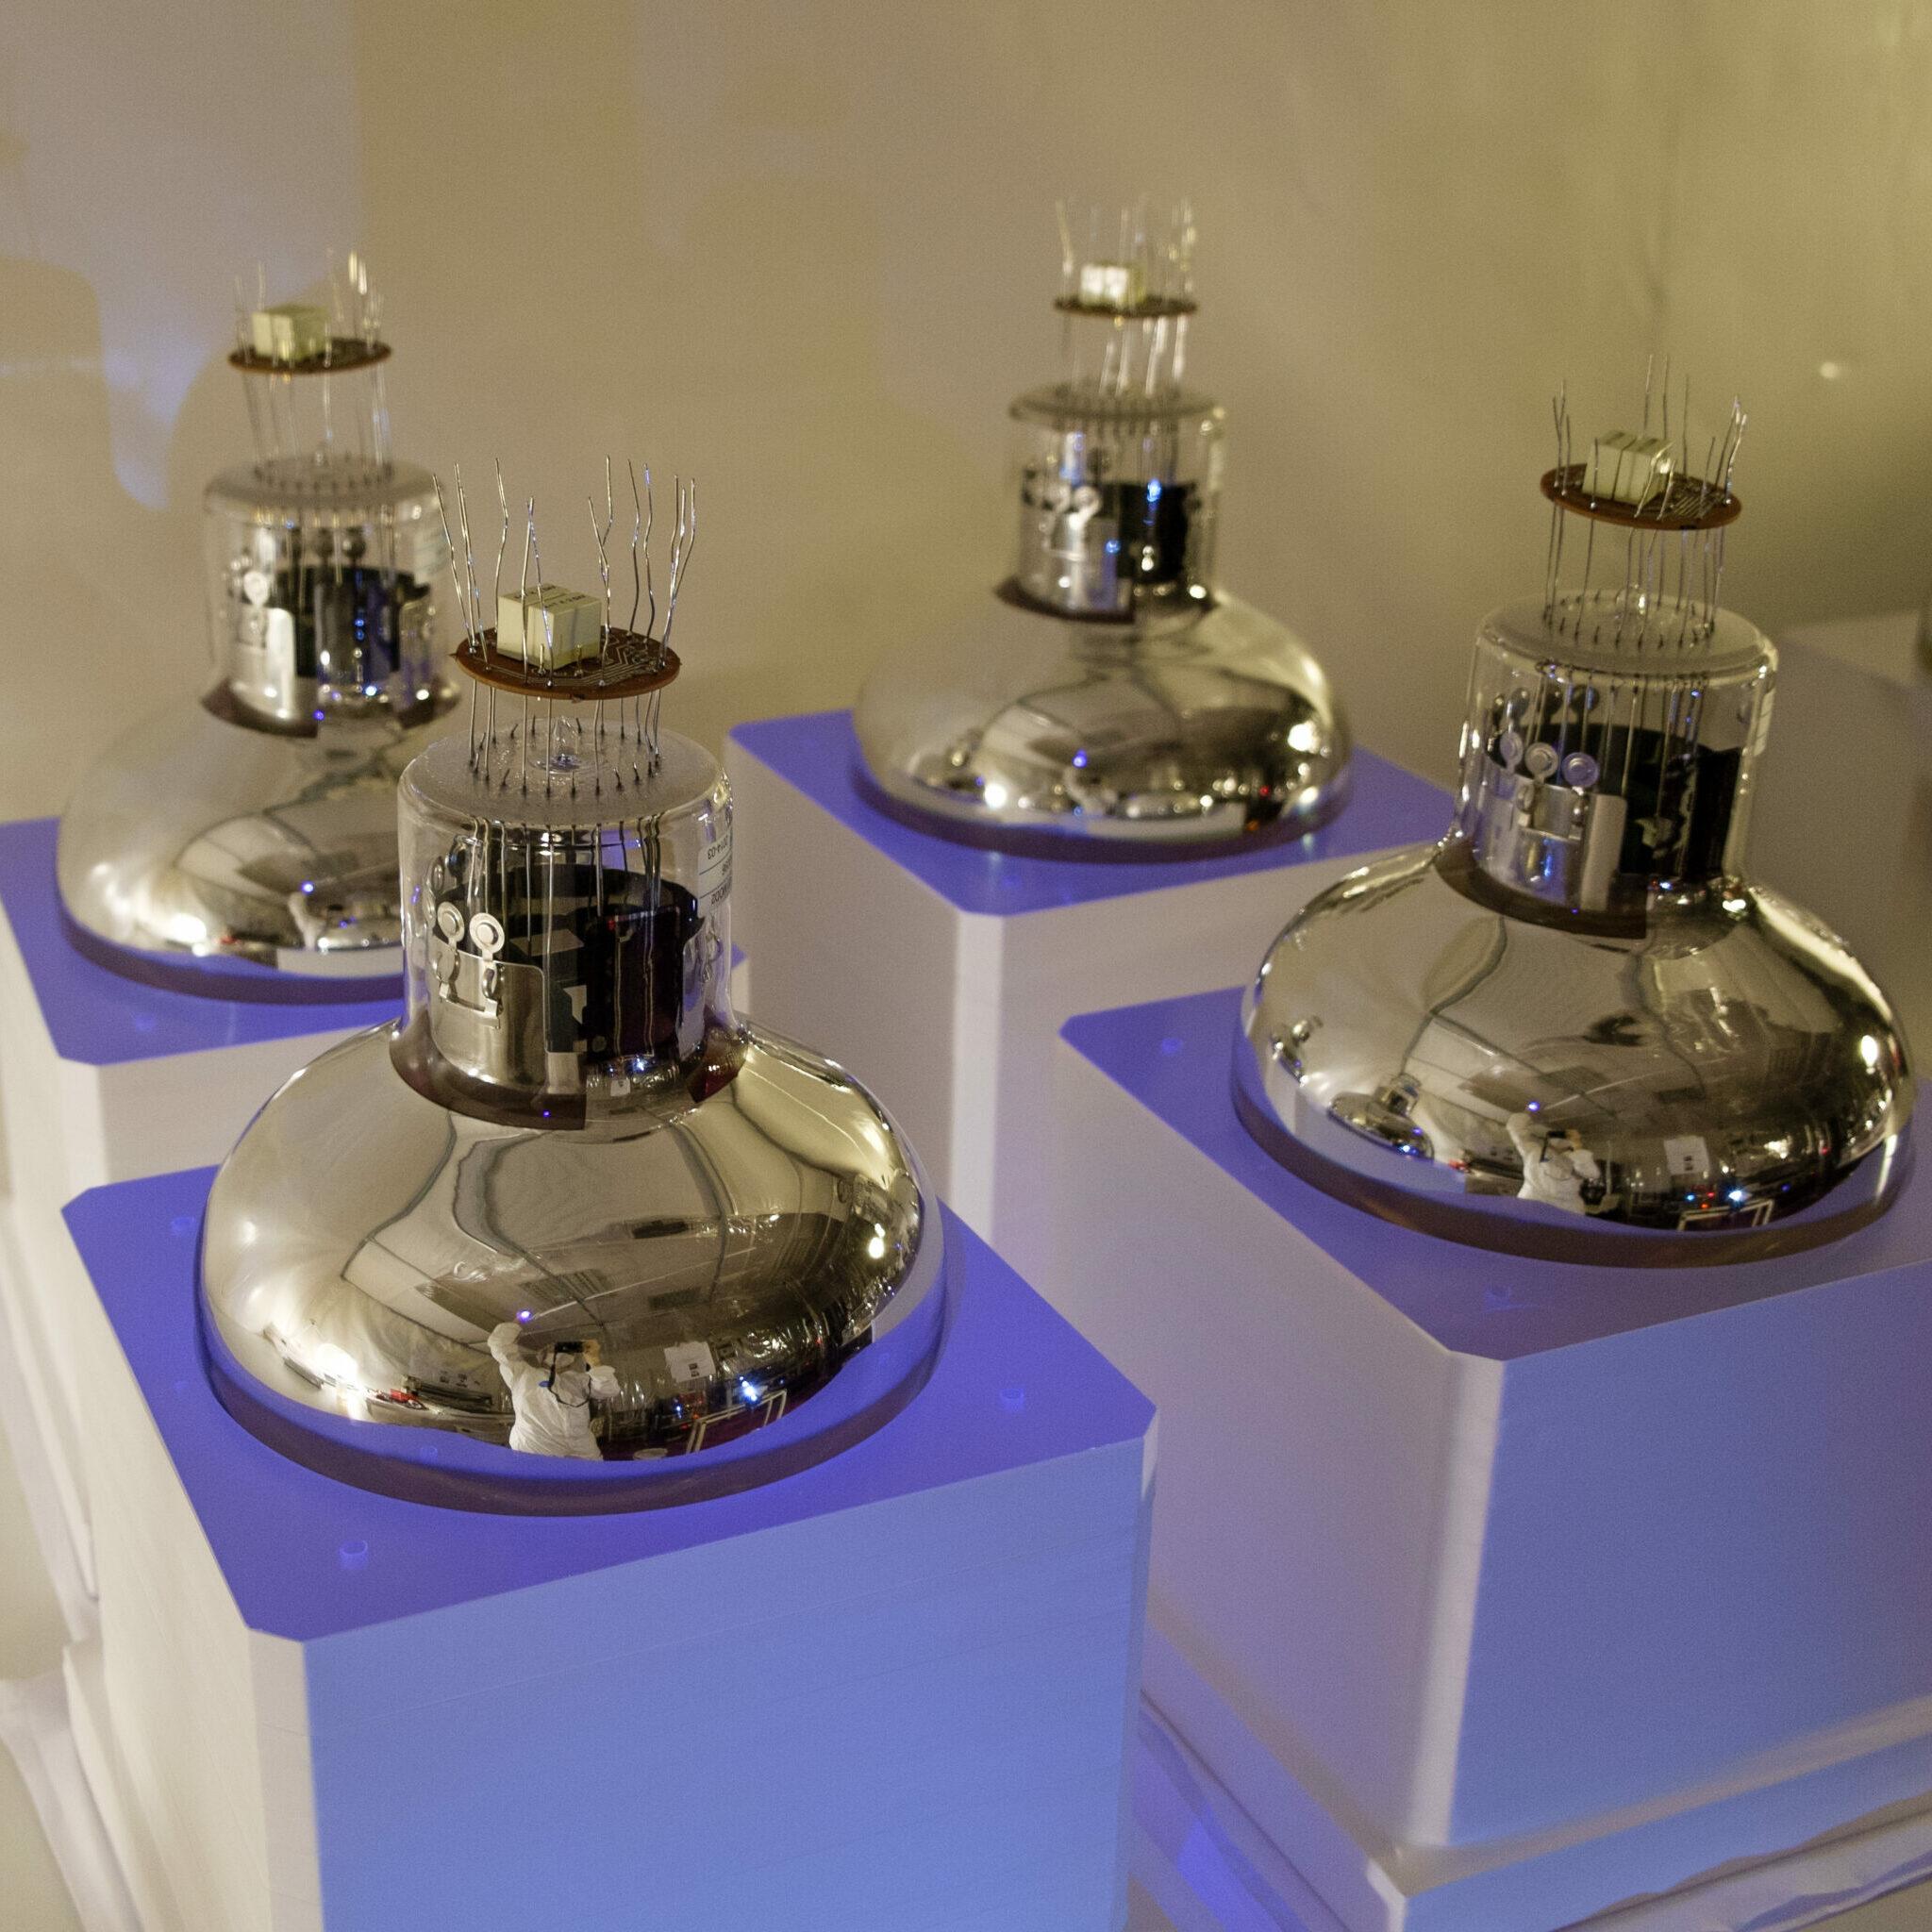 SuperNEMO experiments | Calorimeter, construction